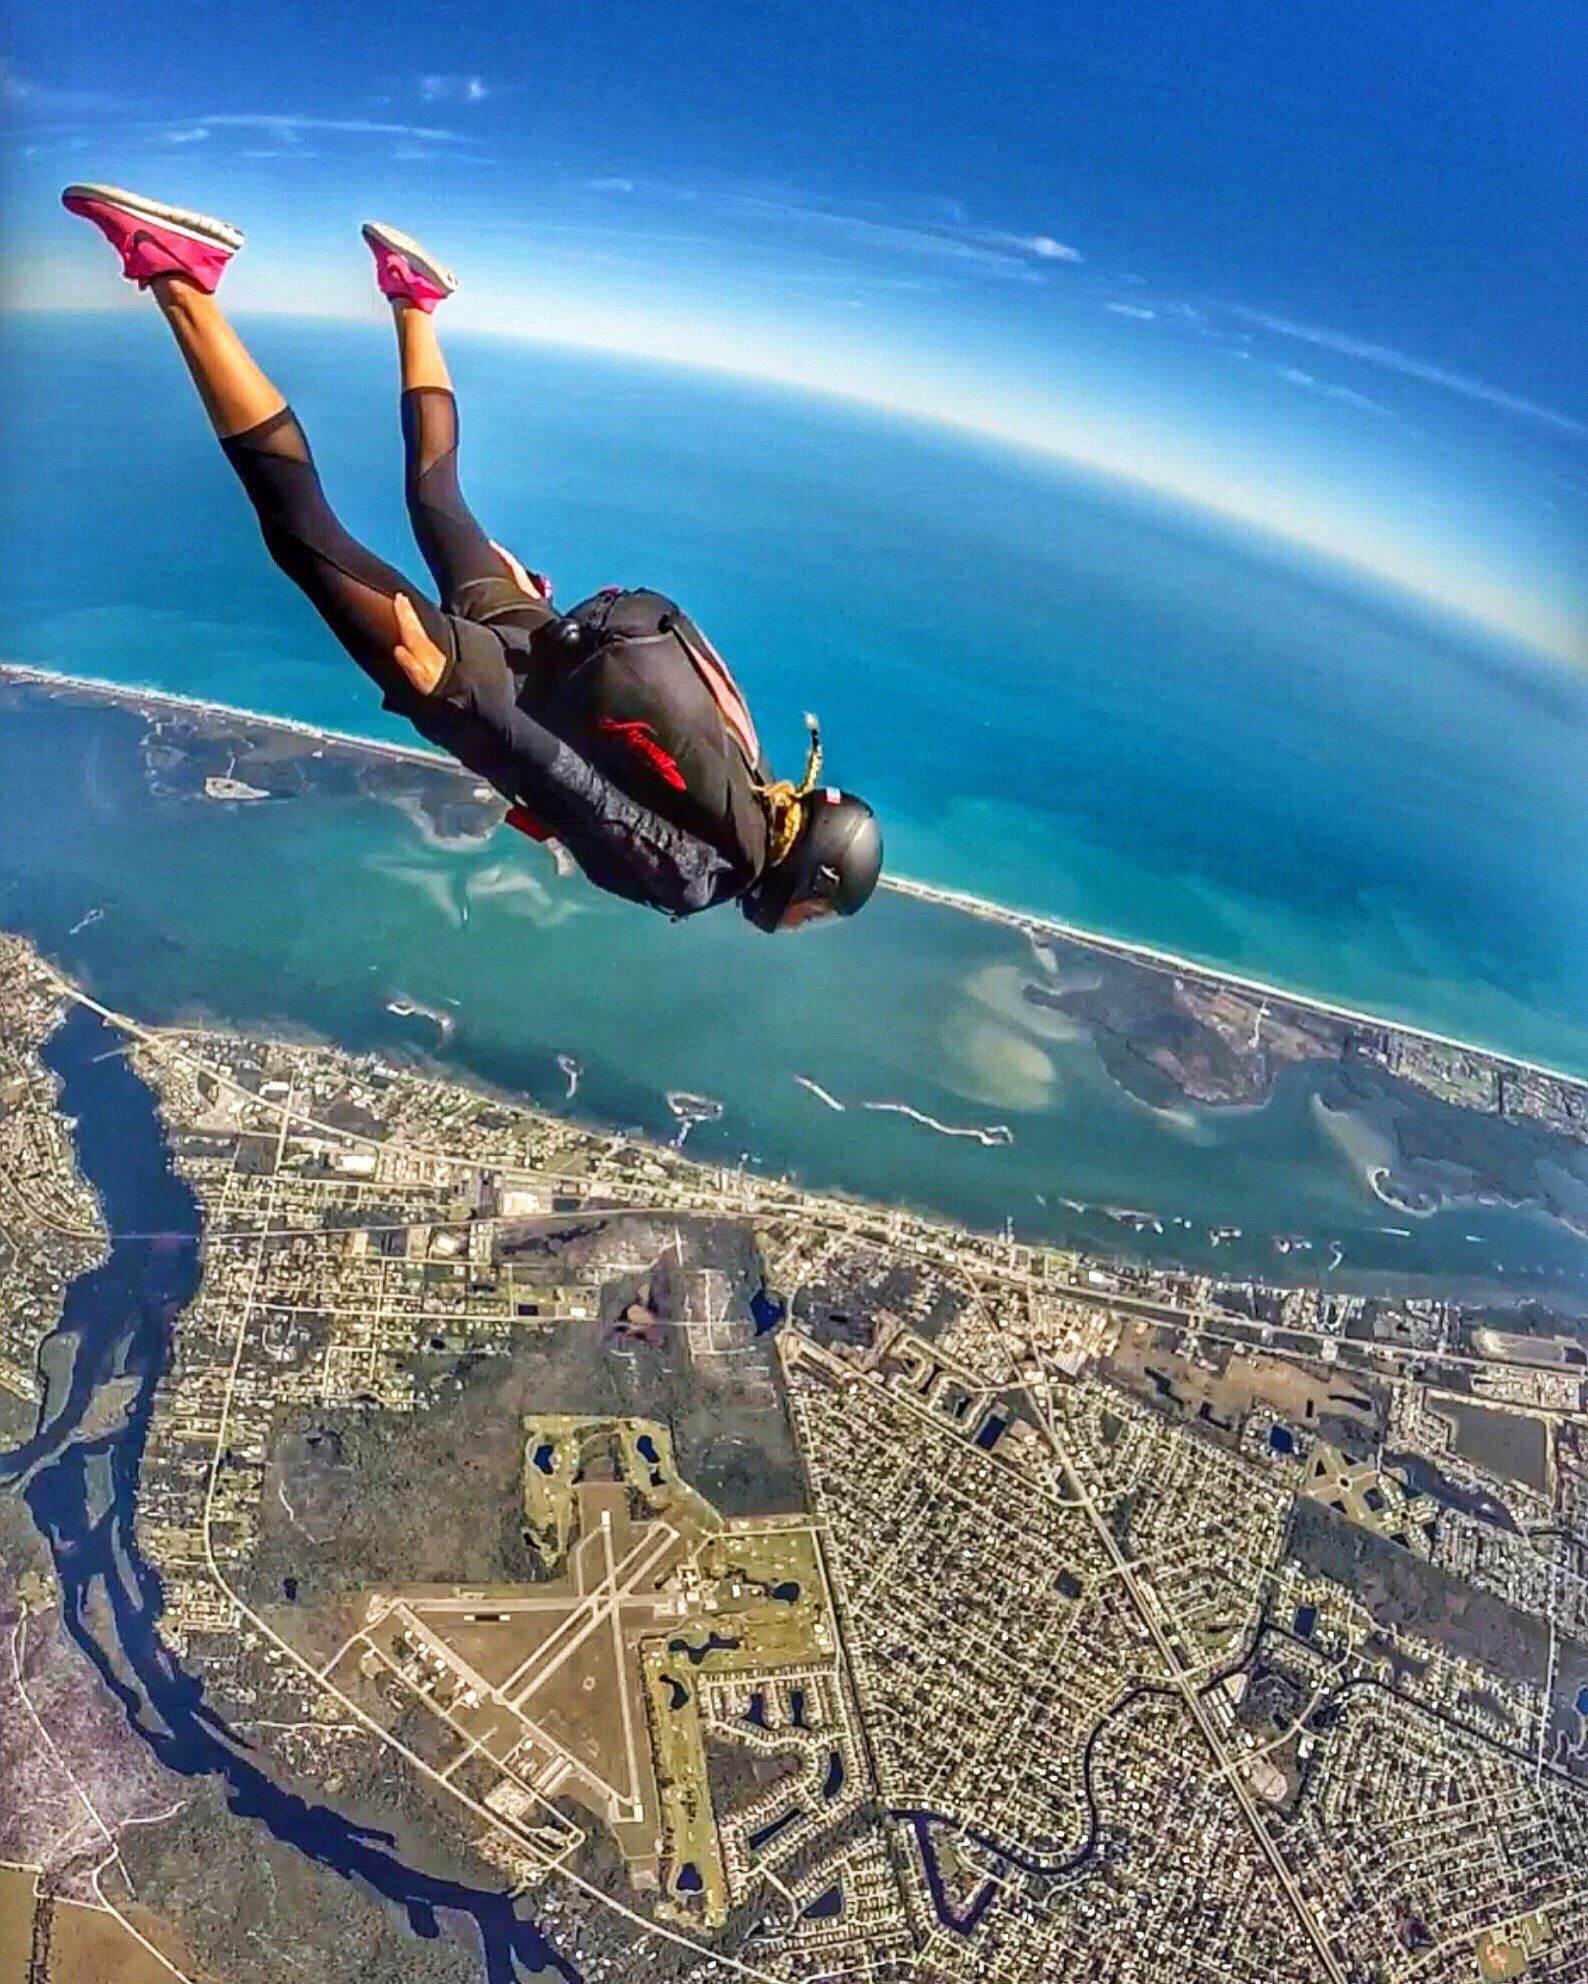 Thisadventurelife At Adventurelife Twitter Skydiving